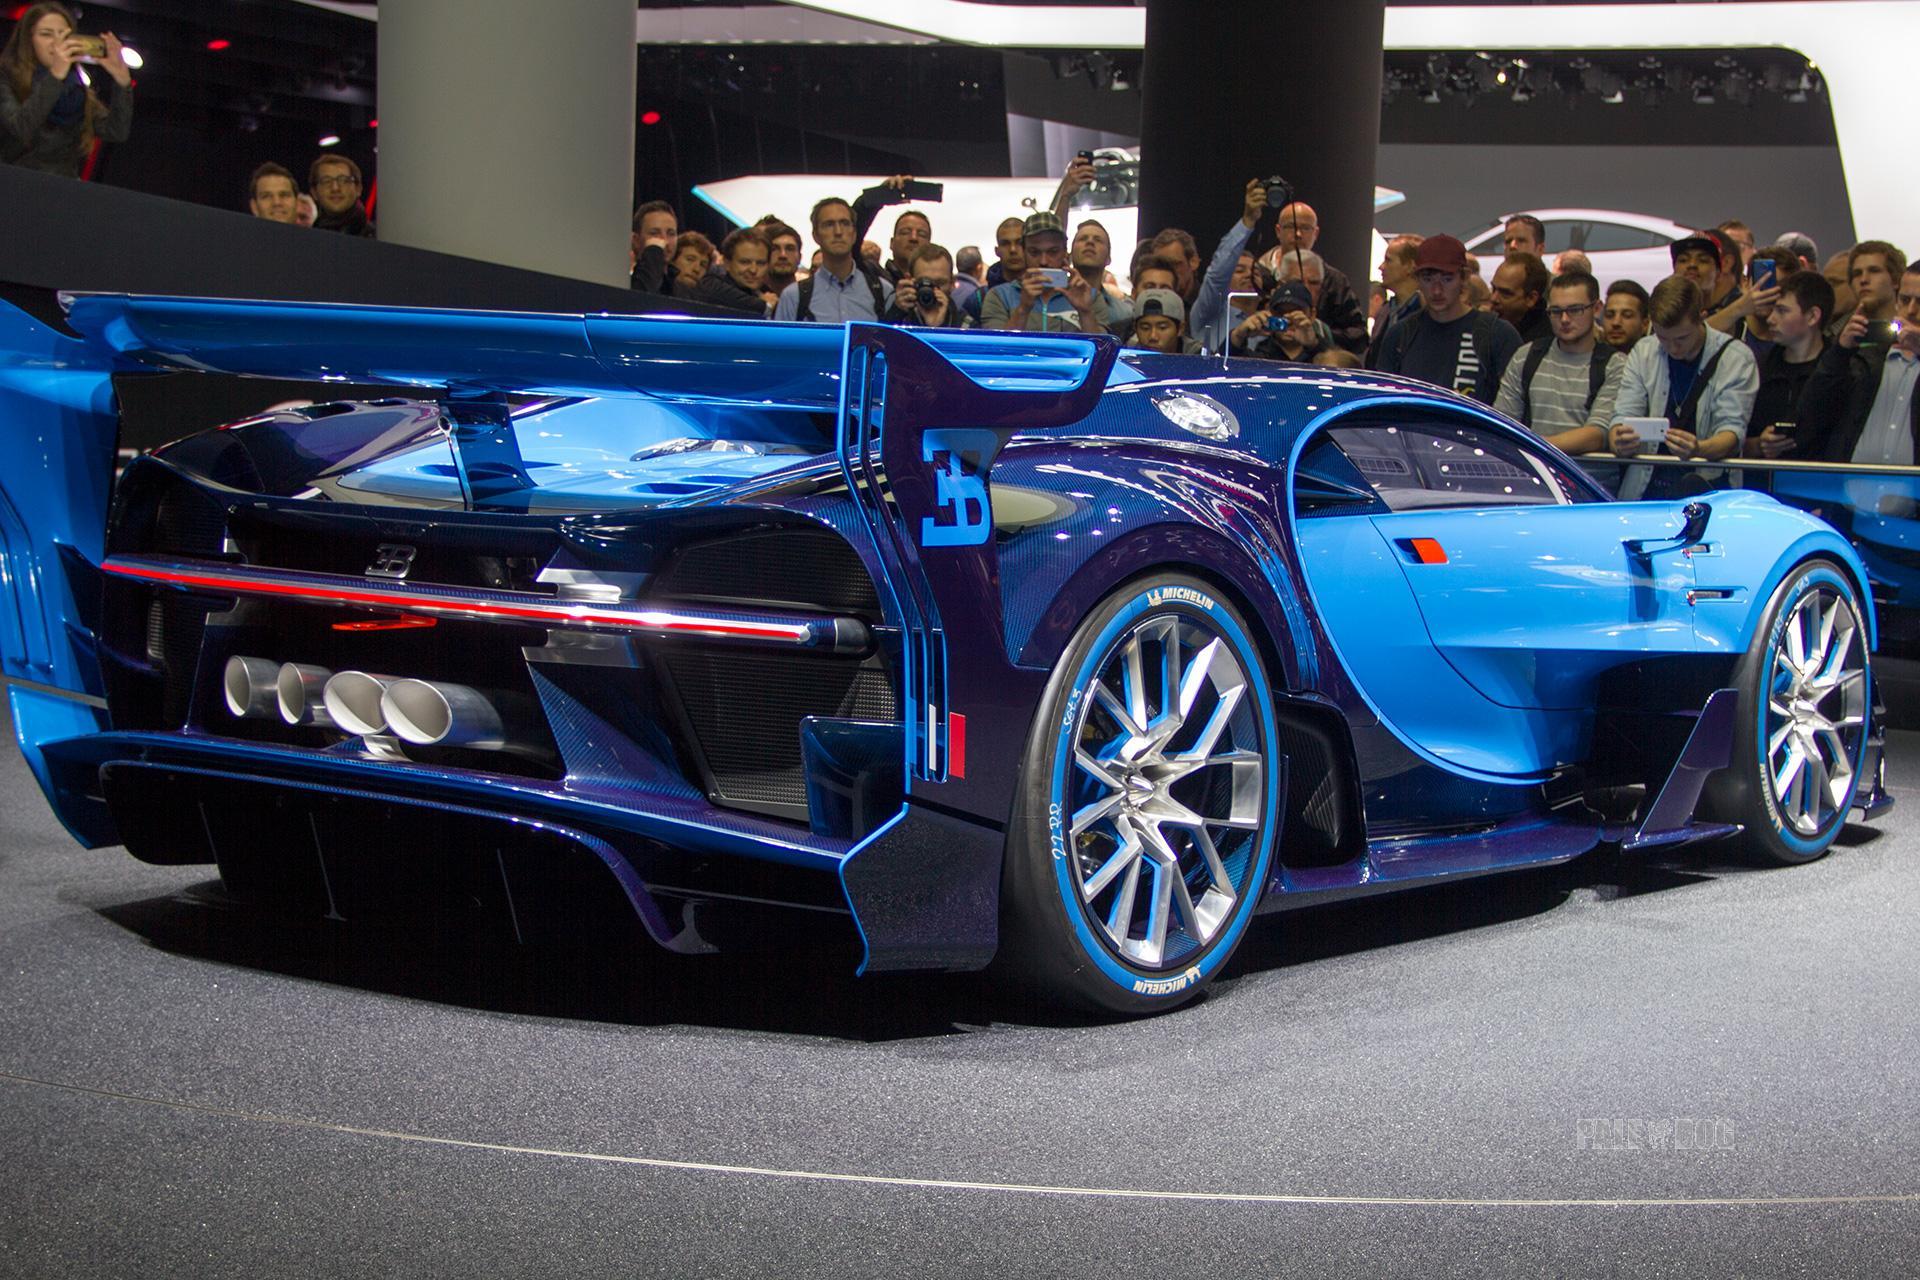 Bugatti   Paledog Photo Collection on ariel atom rear, 1967 camaro rear, srt viper rear, 1970 camaro rear, veyron rear, 2014 camaro rear, mustang rear, volkswagen rear, 1968 camaro rear, hennessey venom gt rear, aston martin rear, ac cobra rear, koenigsegg rear, aventador rear,